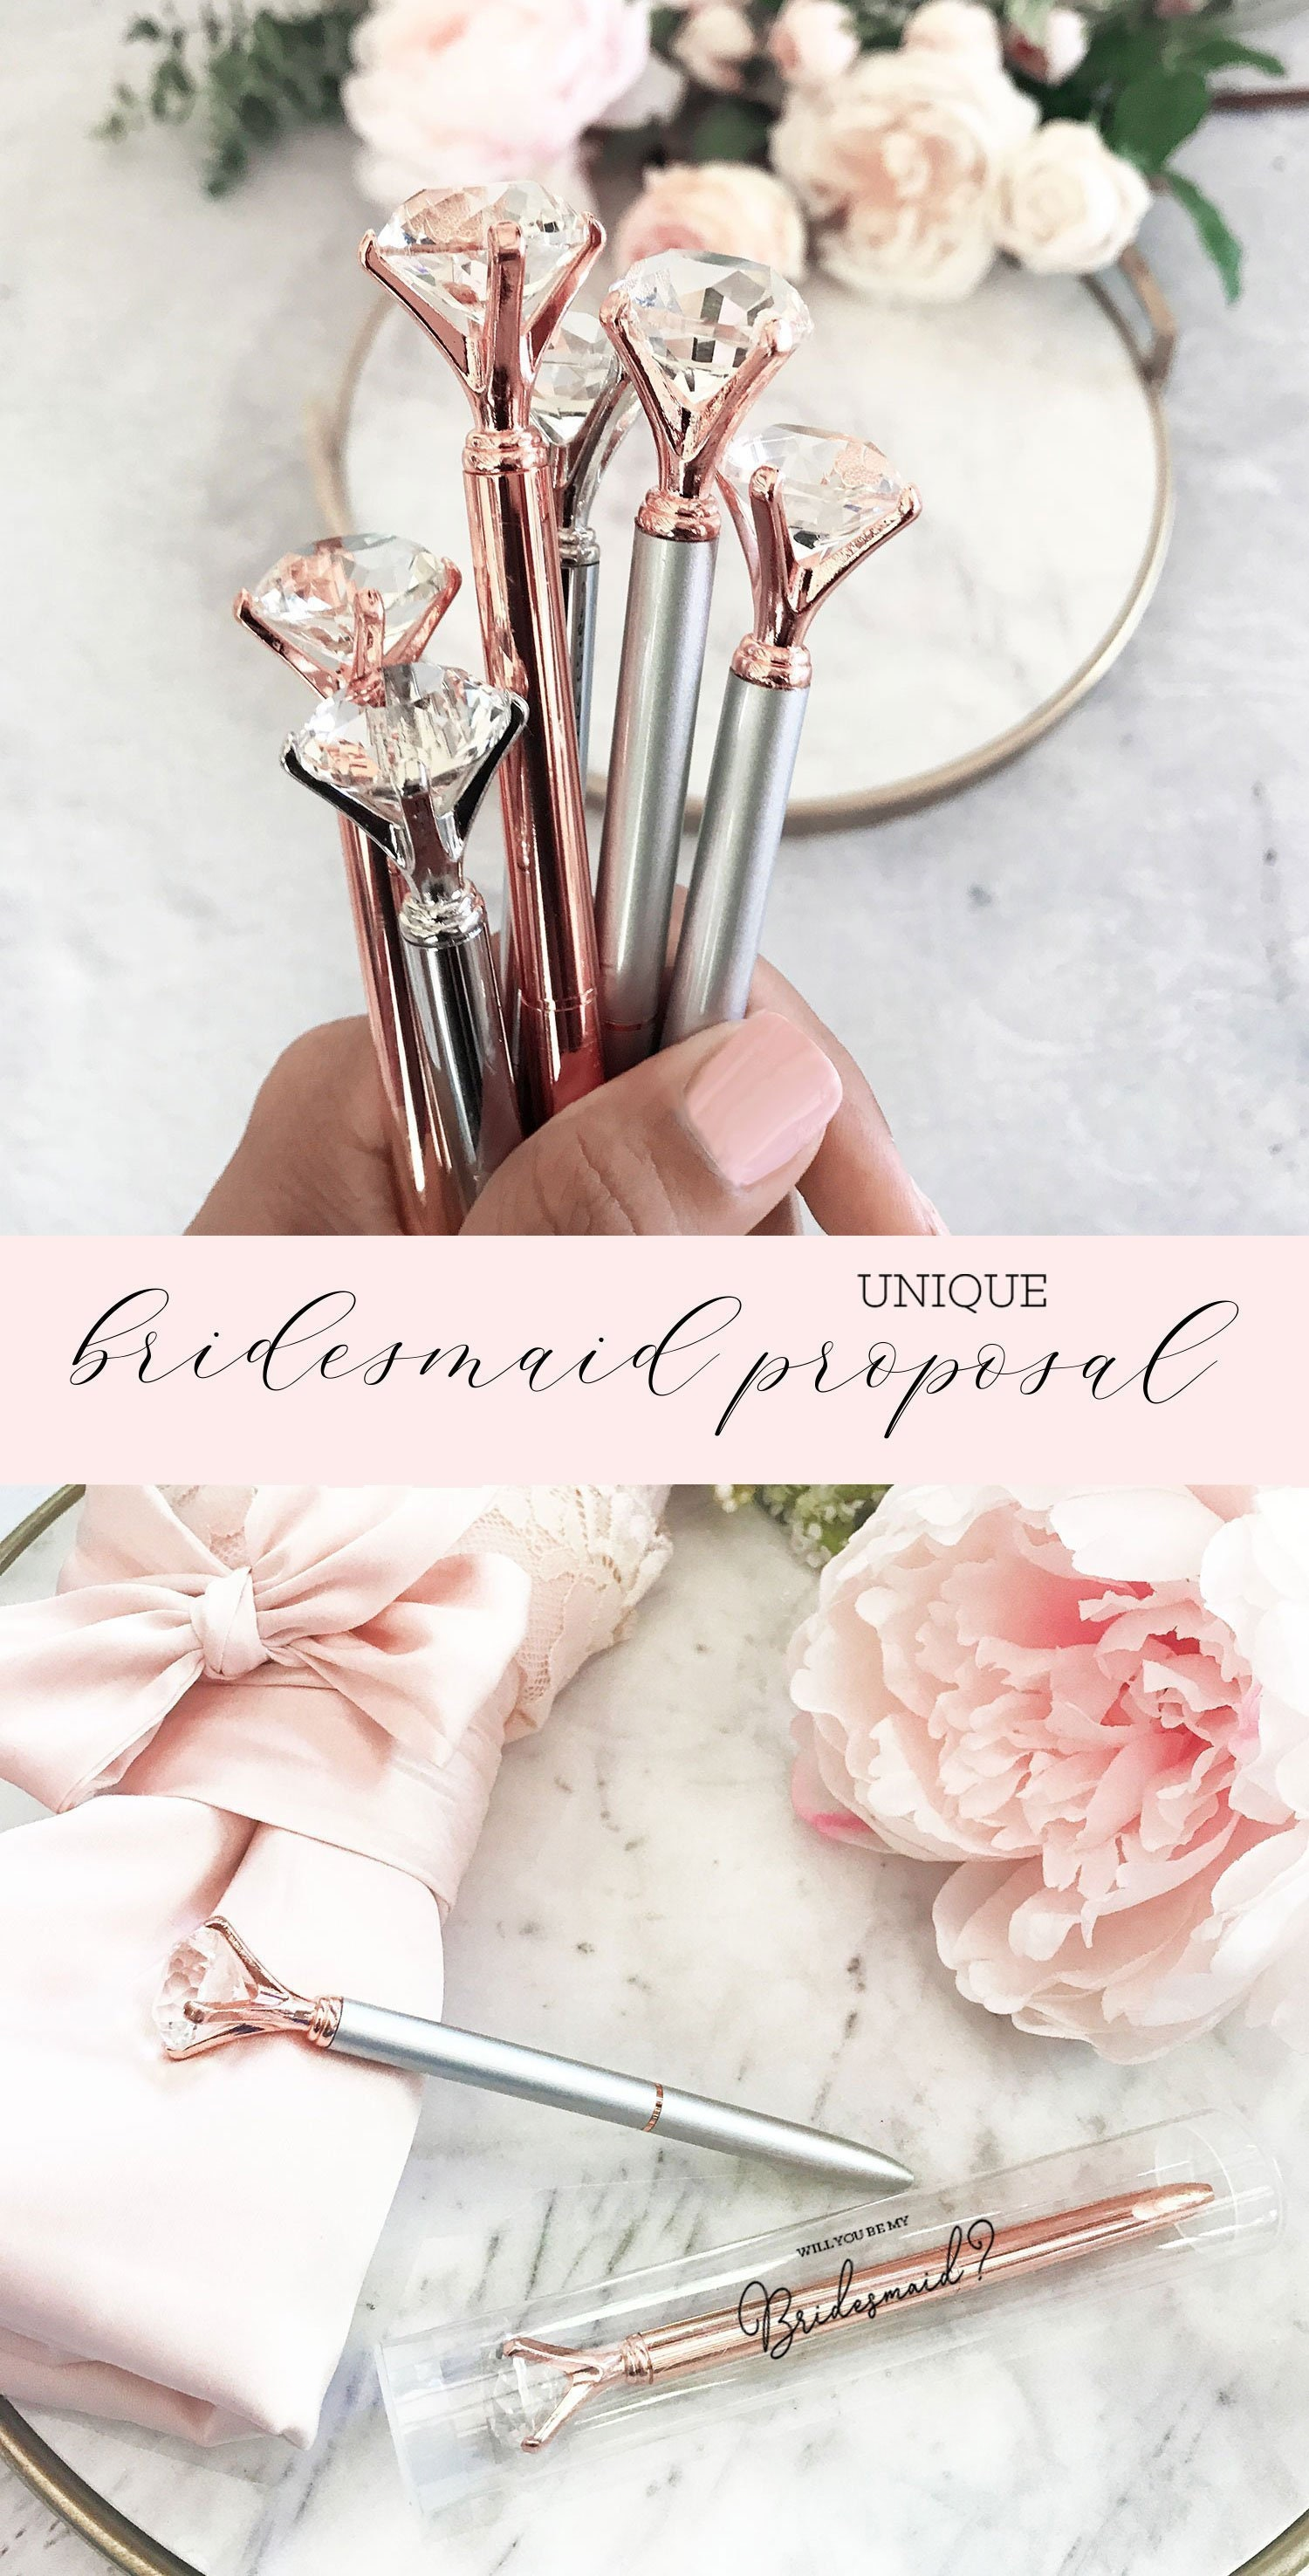 Unique Cheap Wedding Gifts: Bridesmaid Proposal Gift Unique Bridesmaid Gifts Cheap